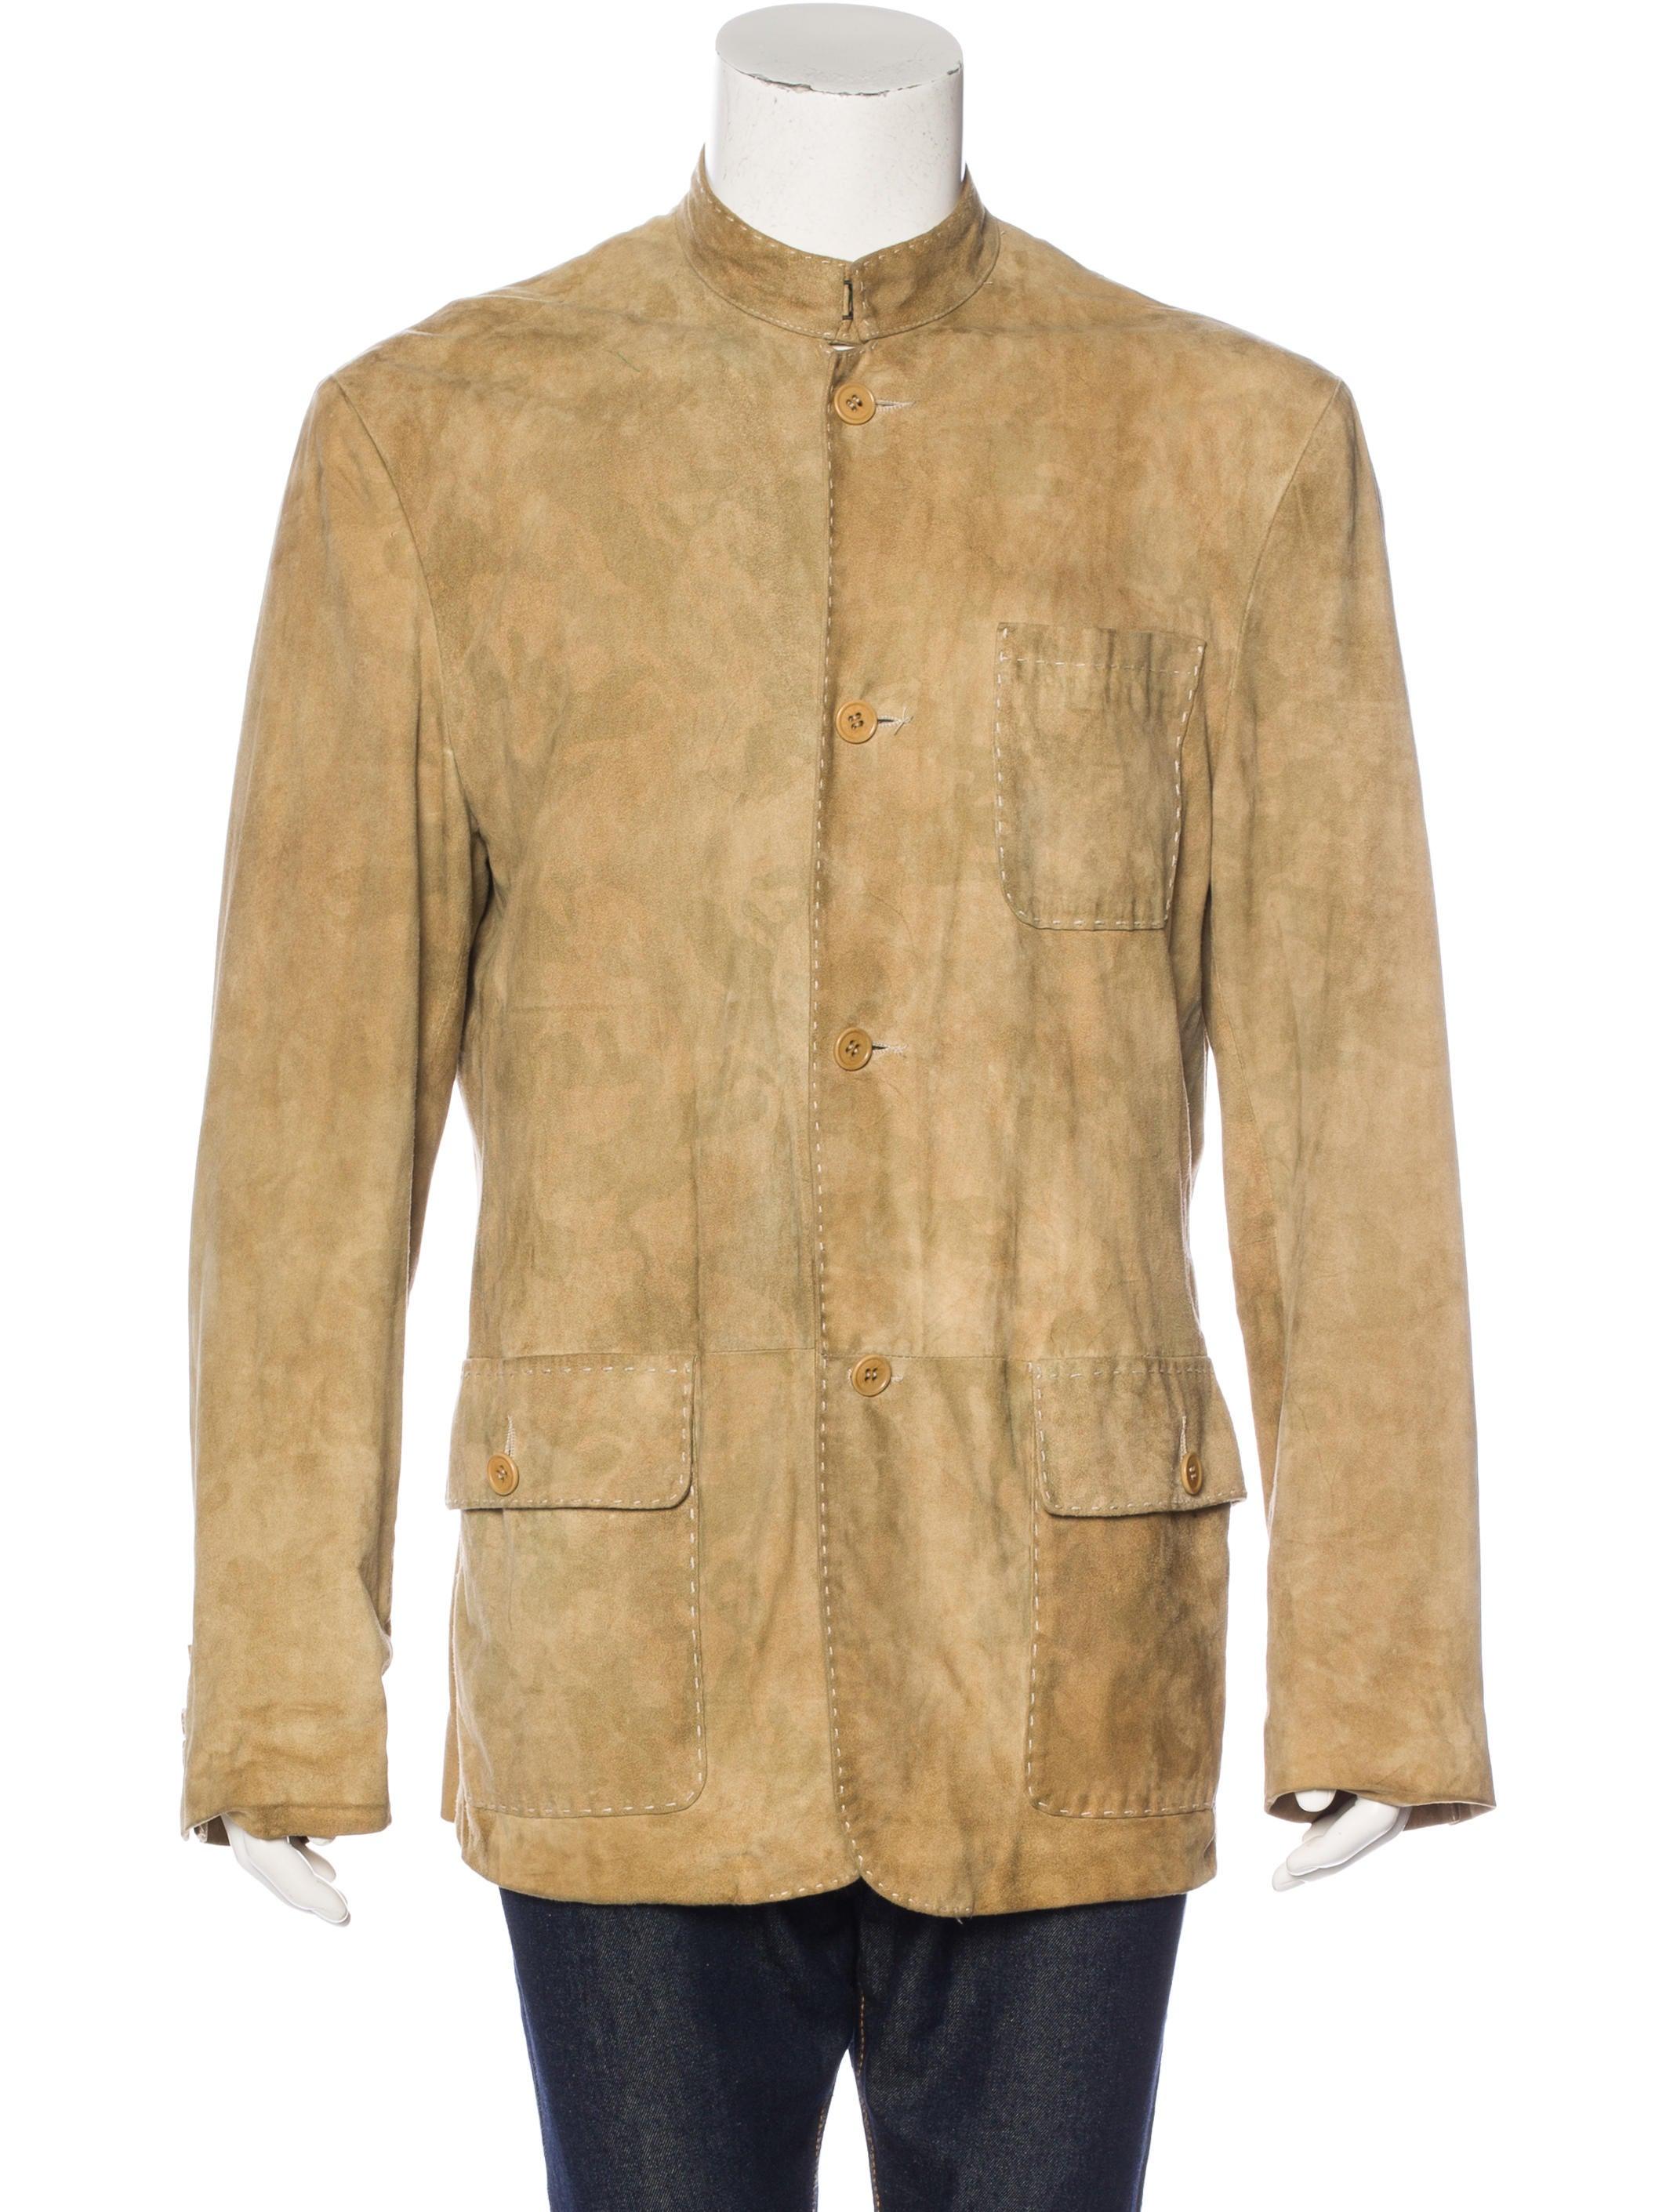 john varvatos suede shirt jacket clothing jva23356